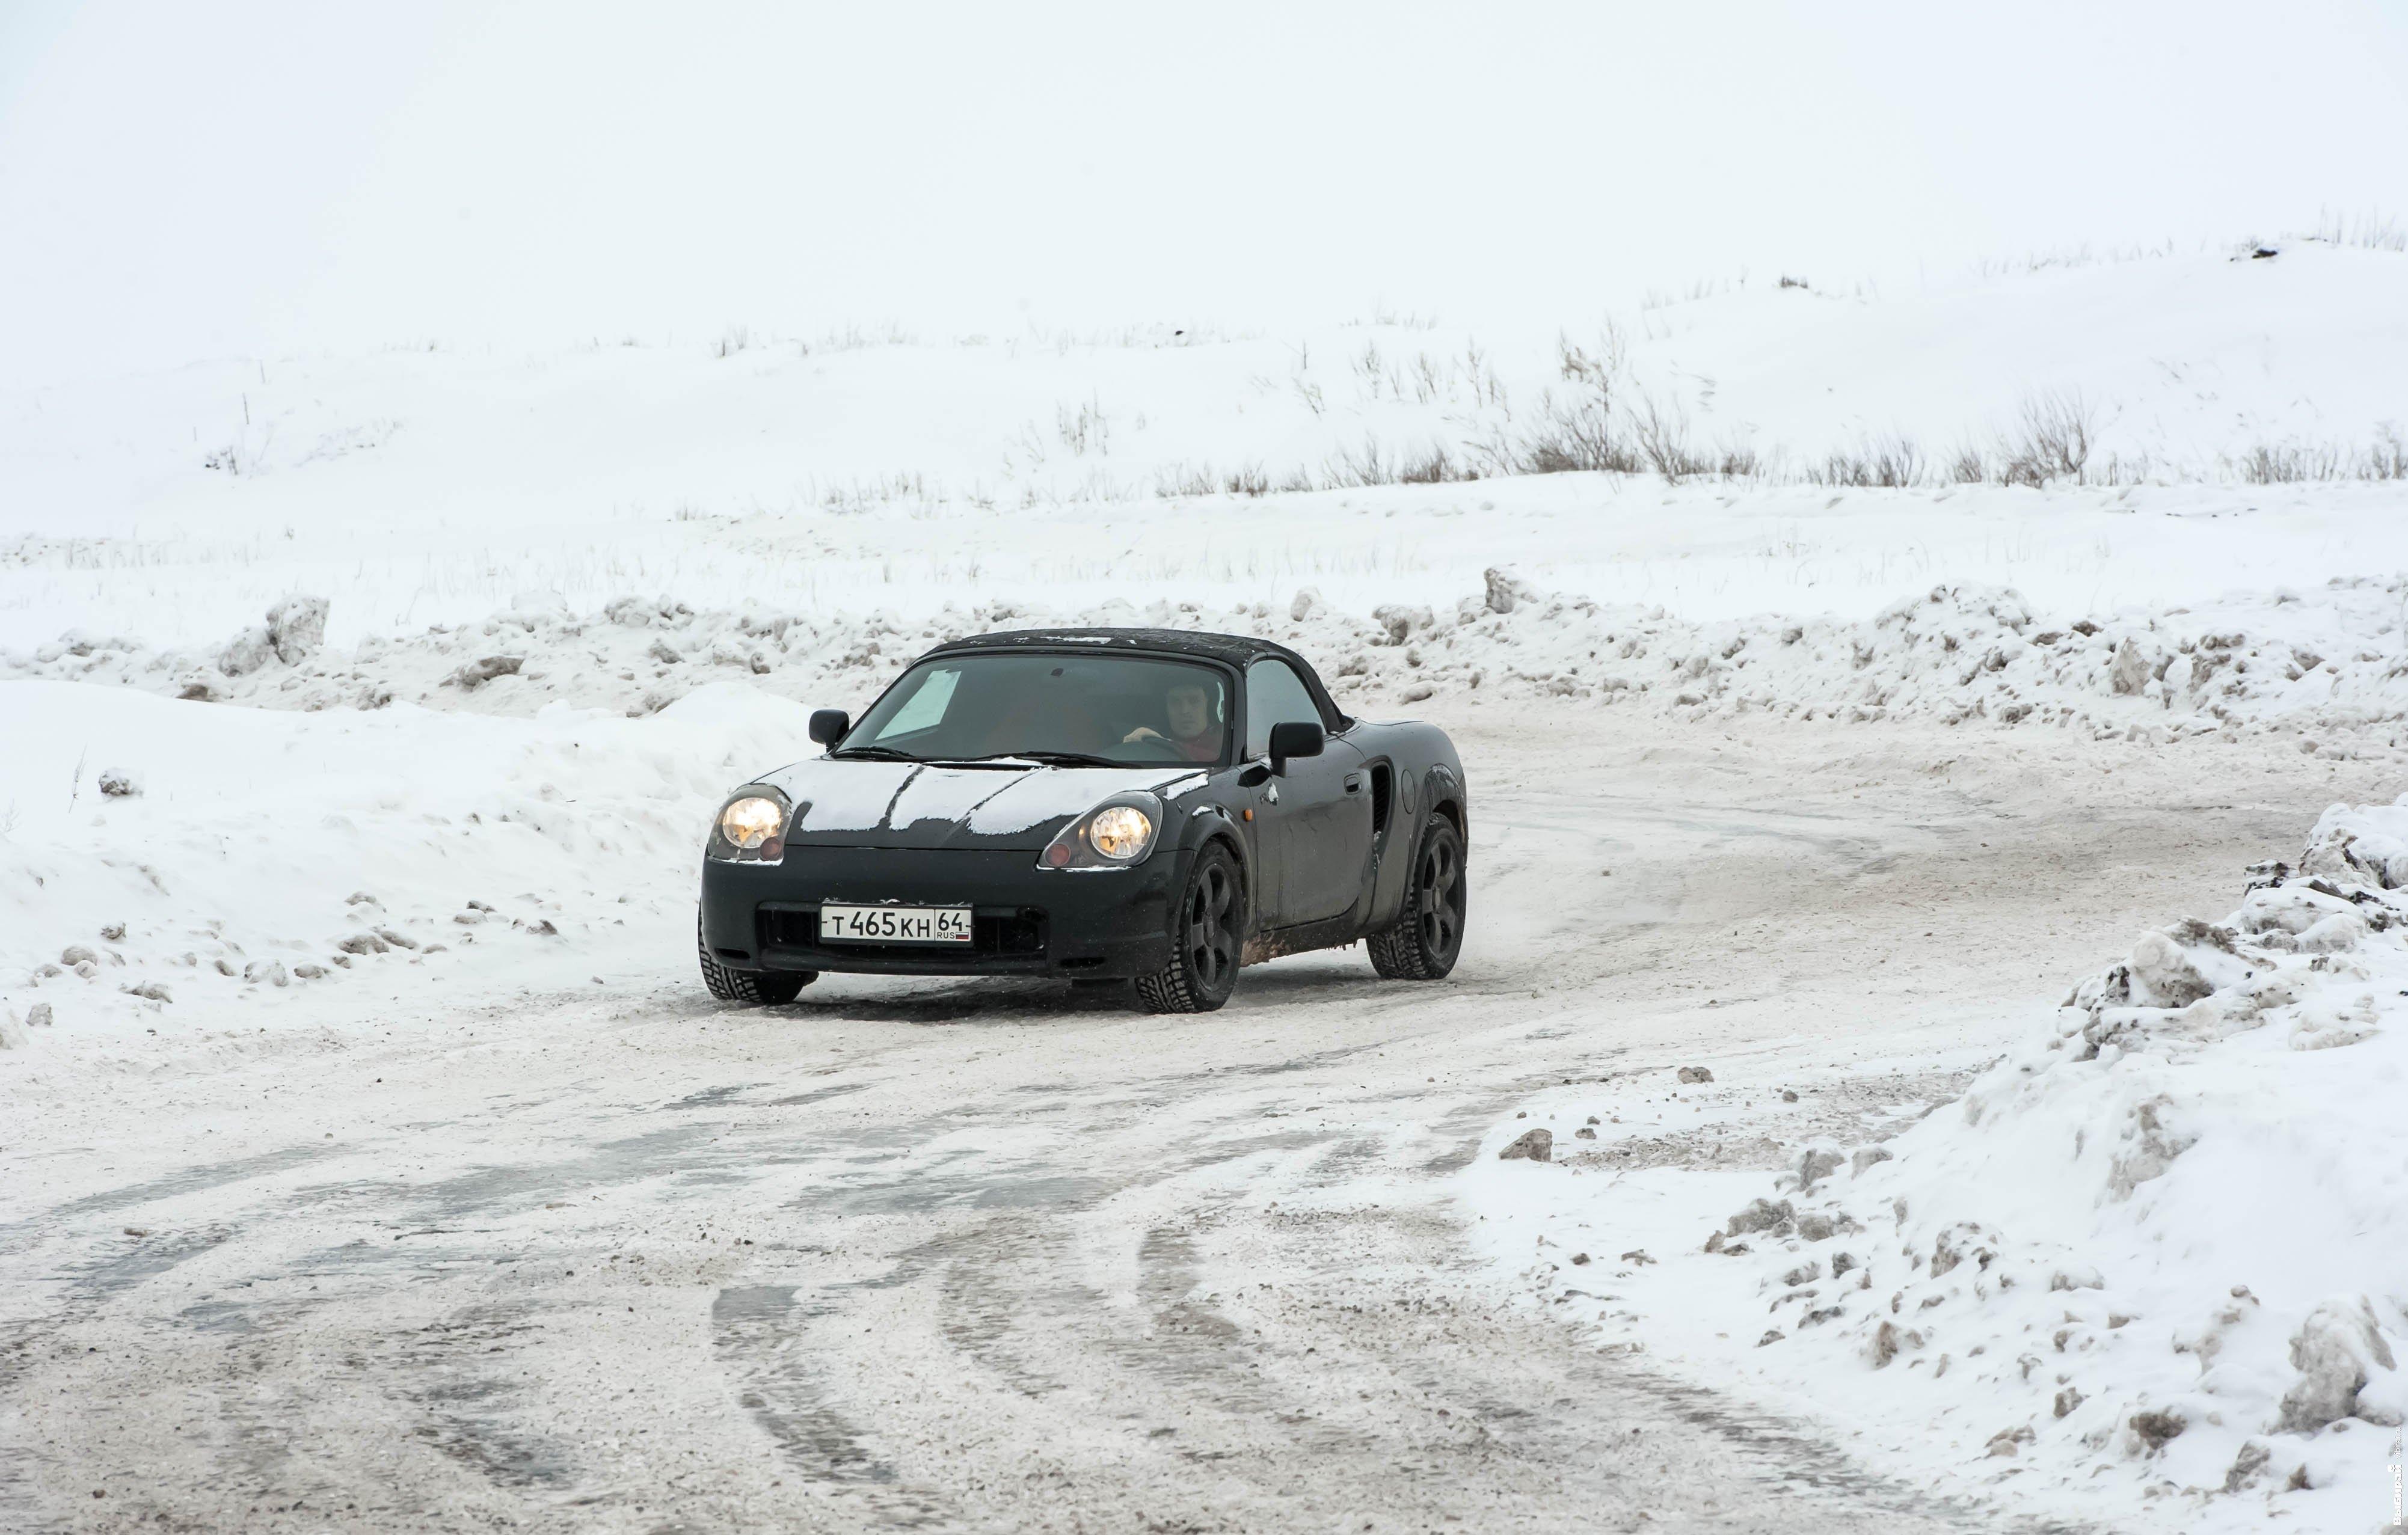 зимняя гонка фрэнки машины короткое